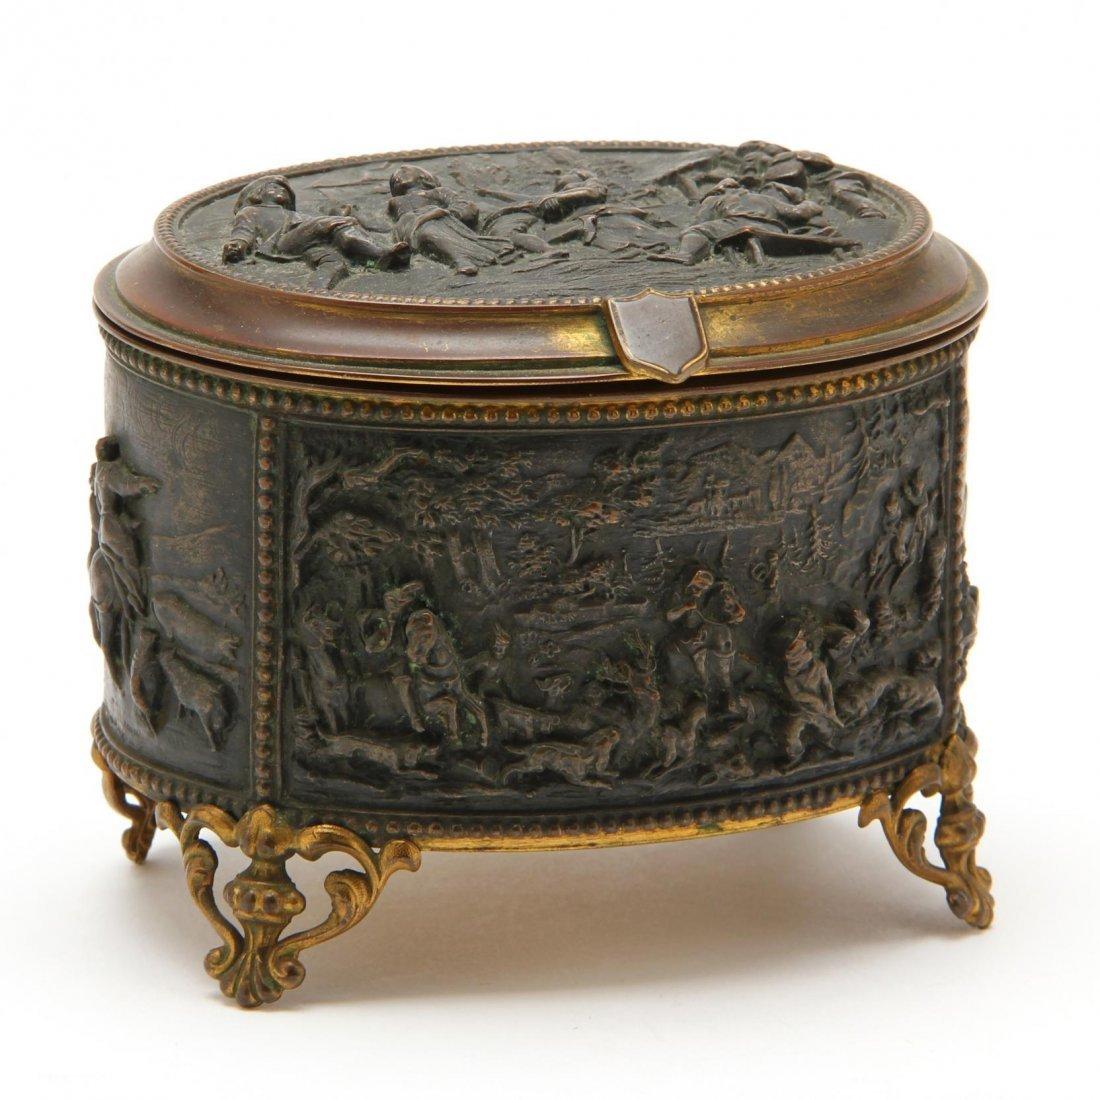 Small French Bronze Jewelry Casket, A.B. Paris